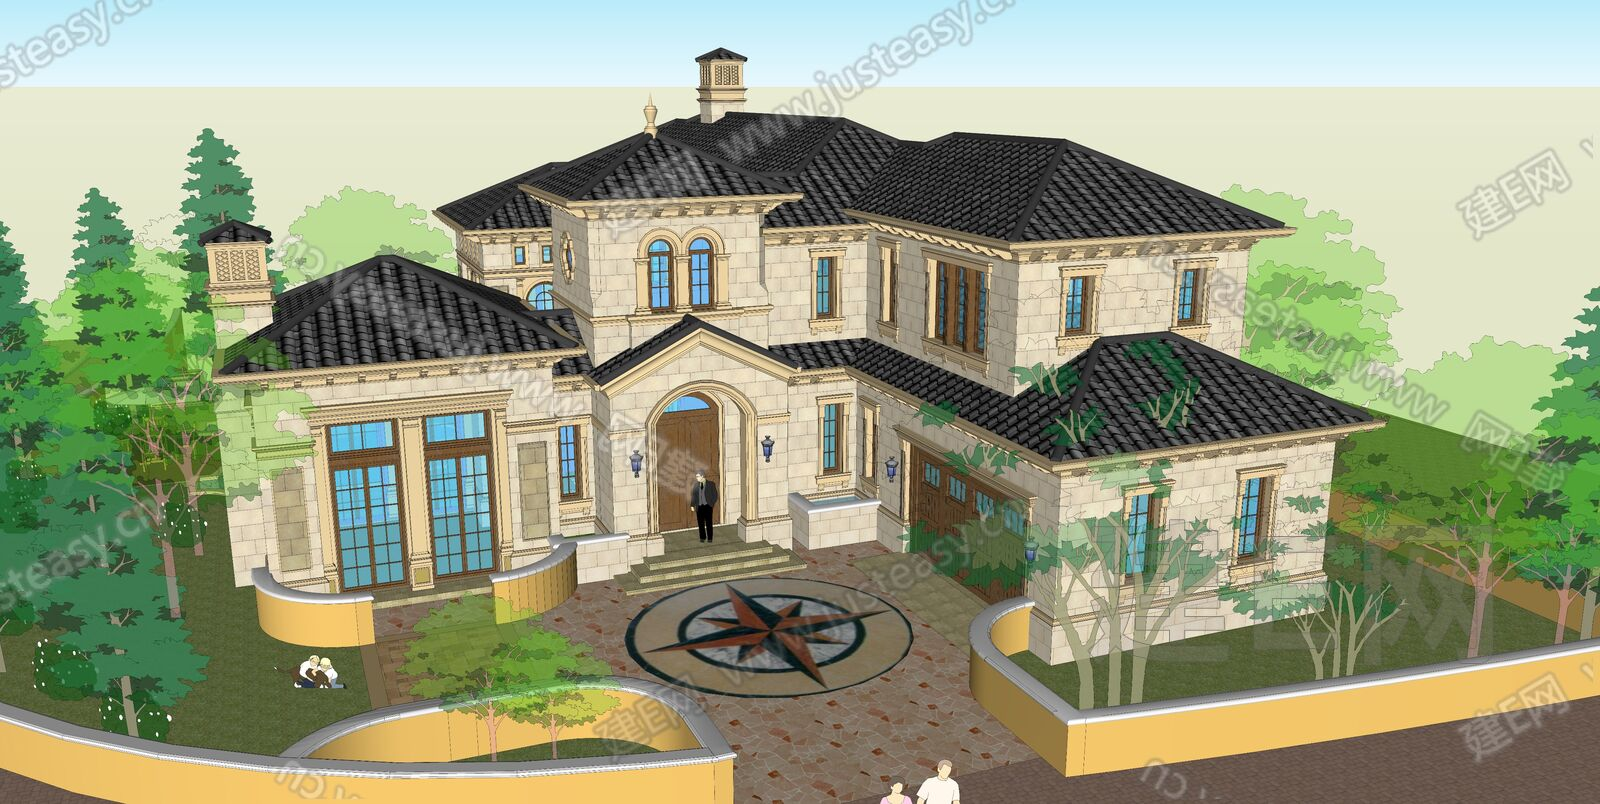 欧式别墅sketchup模型